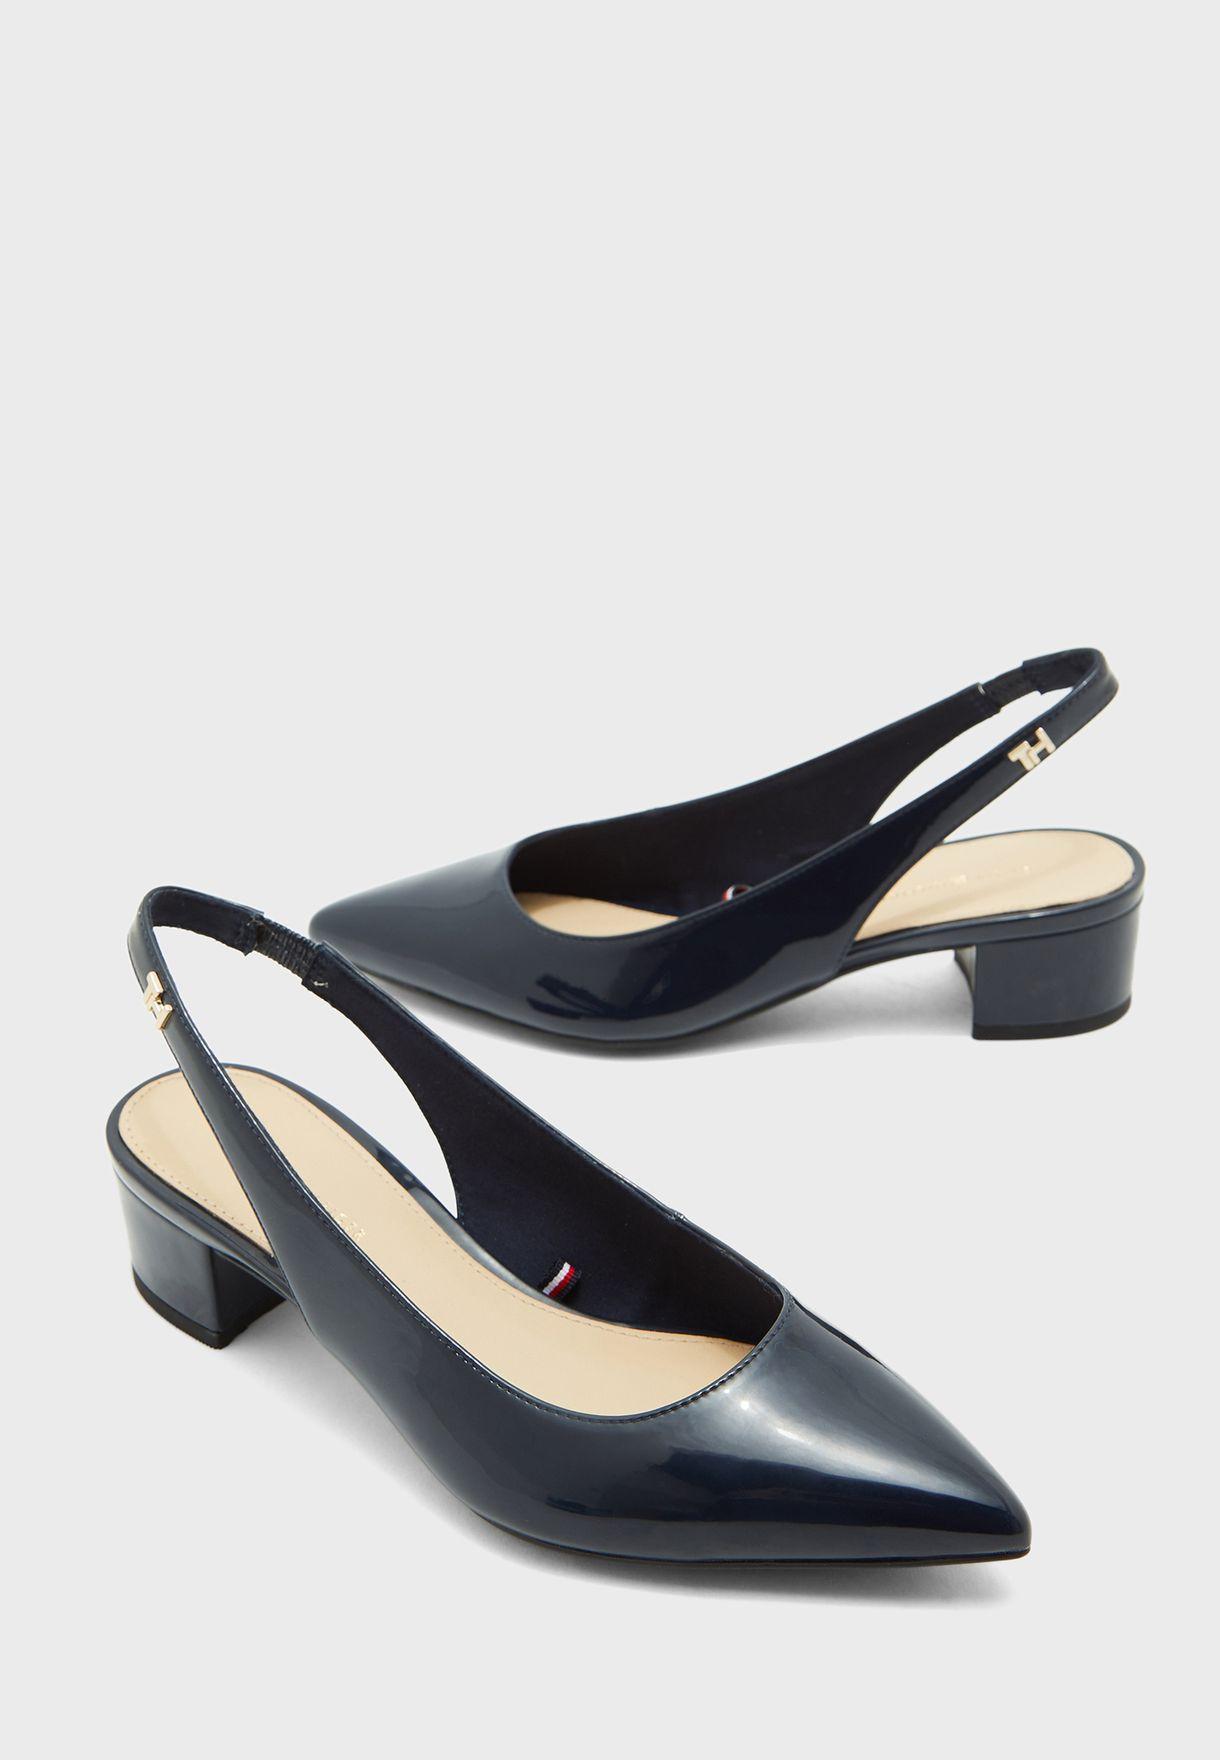 Feminine Patent Mid Heel Pump - DW5